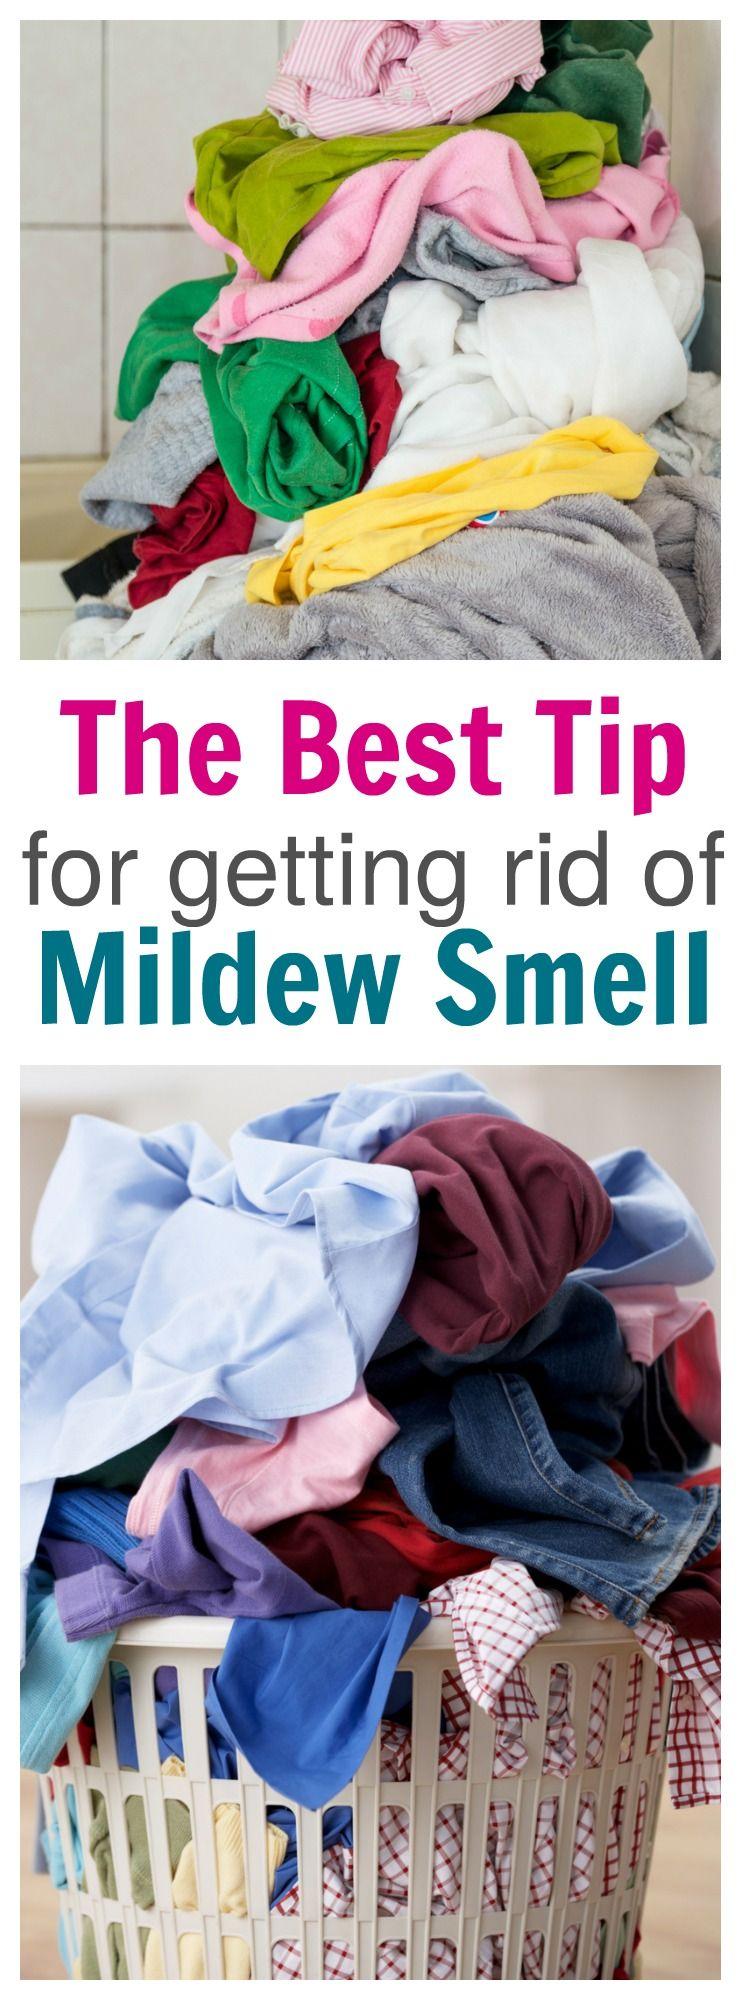 b2d99f4d0478f933dc25af2ebff90430 - How To Get Rid Of Mildew Smell In Hotel Room